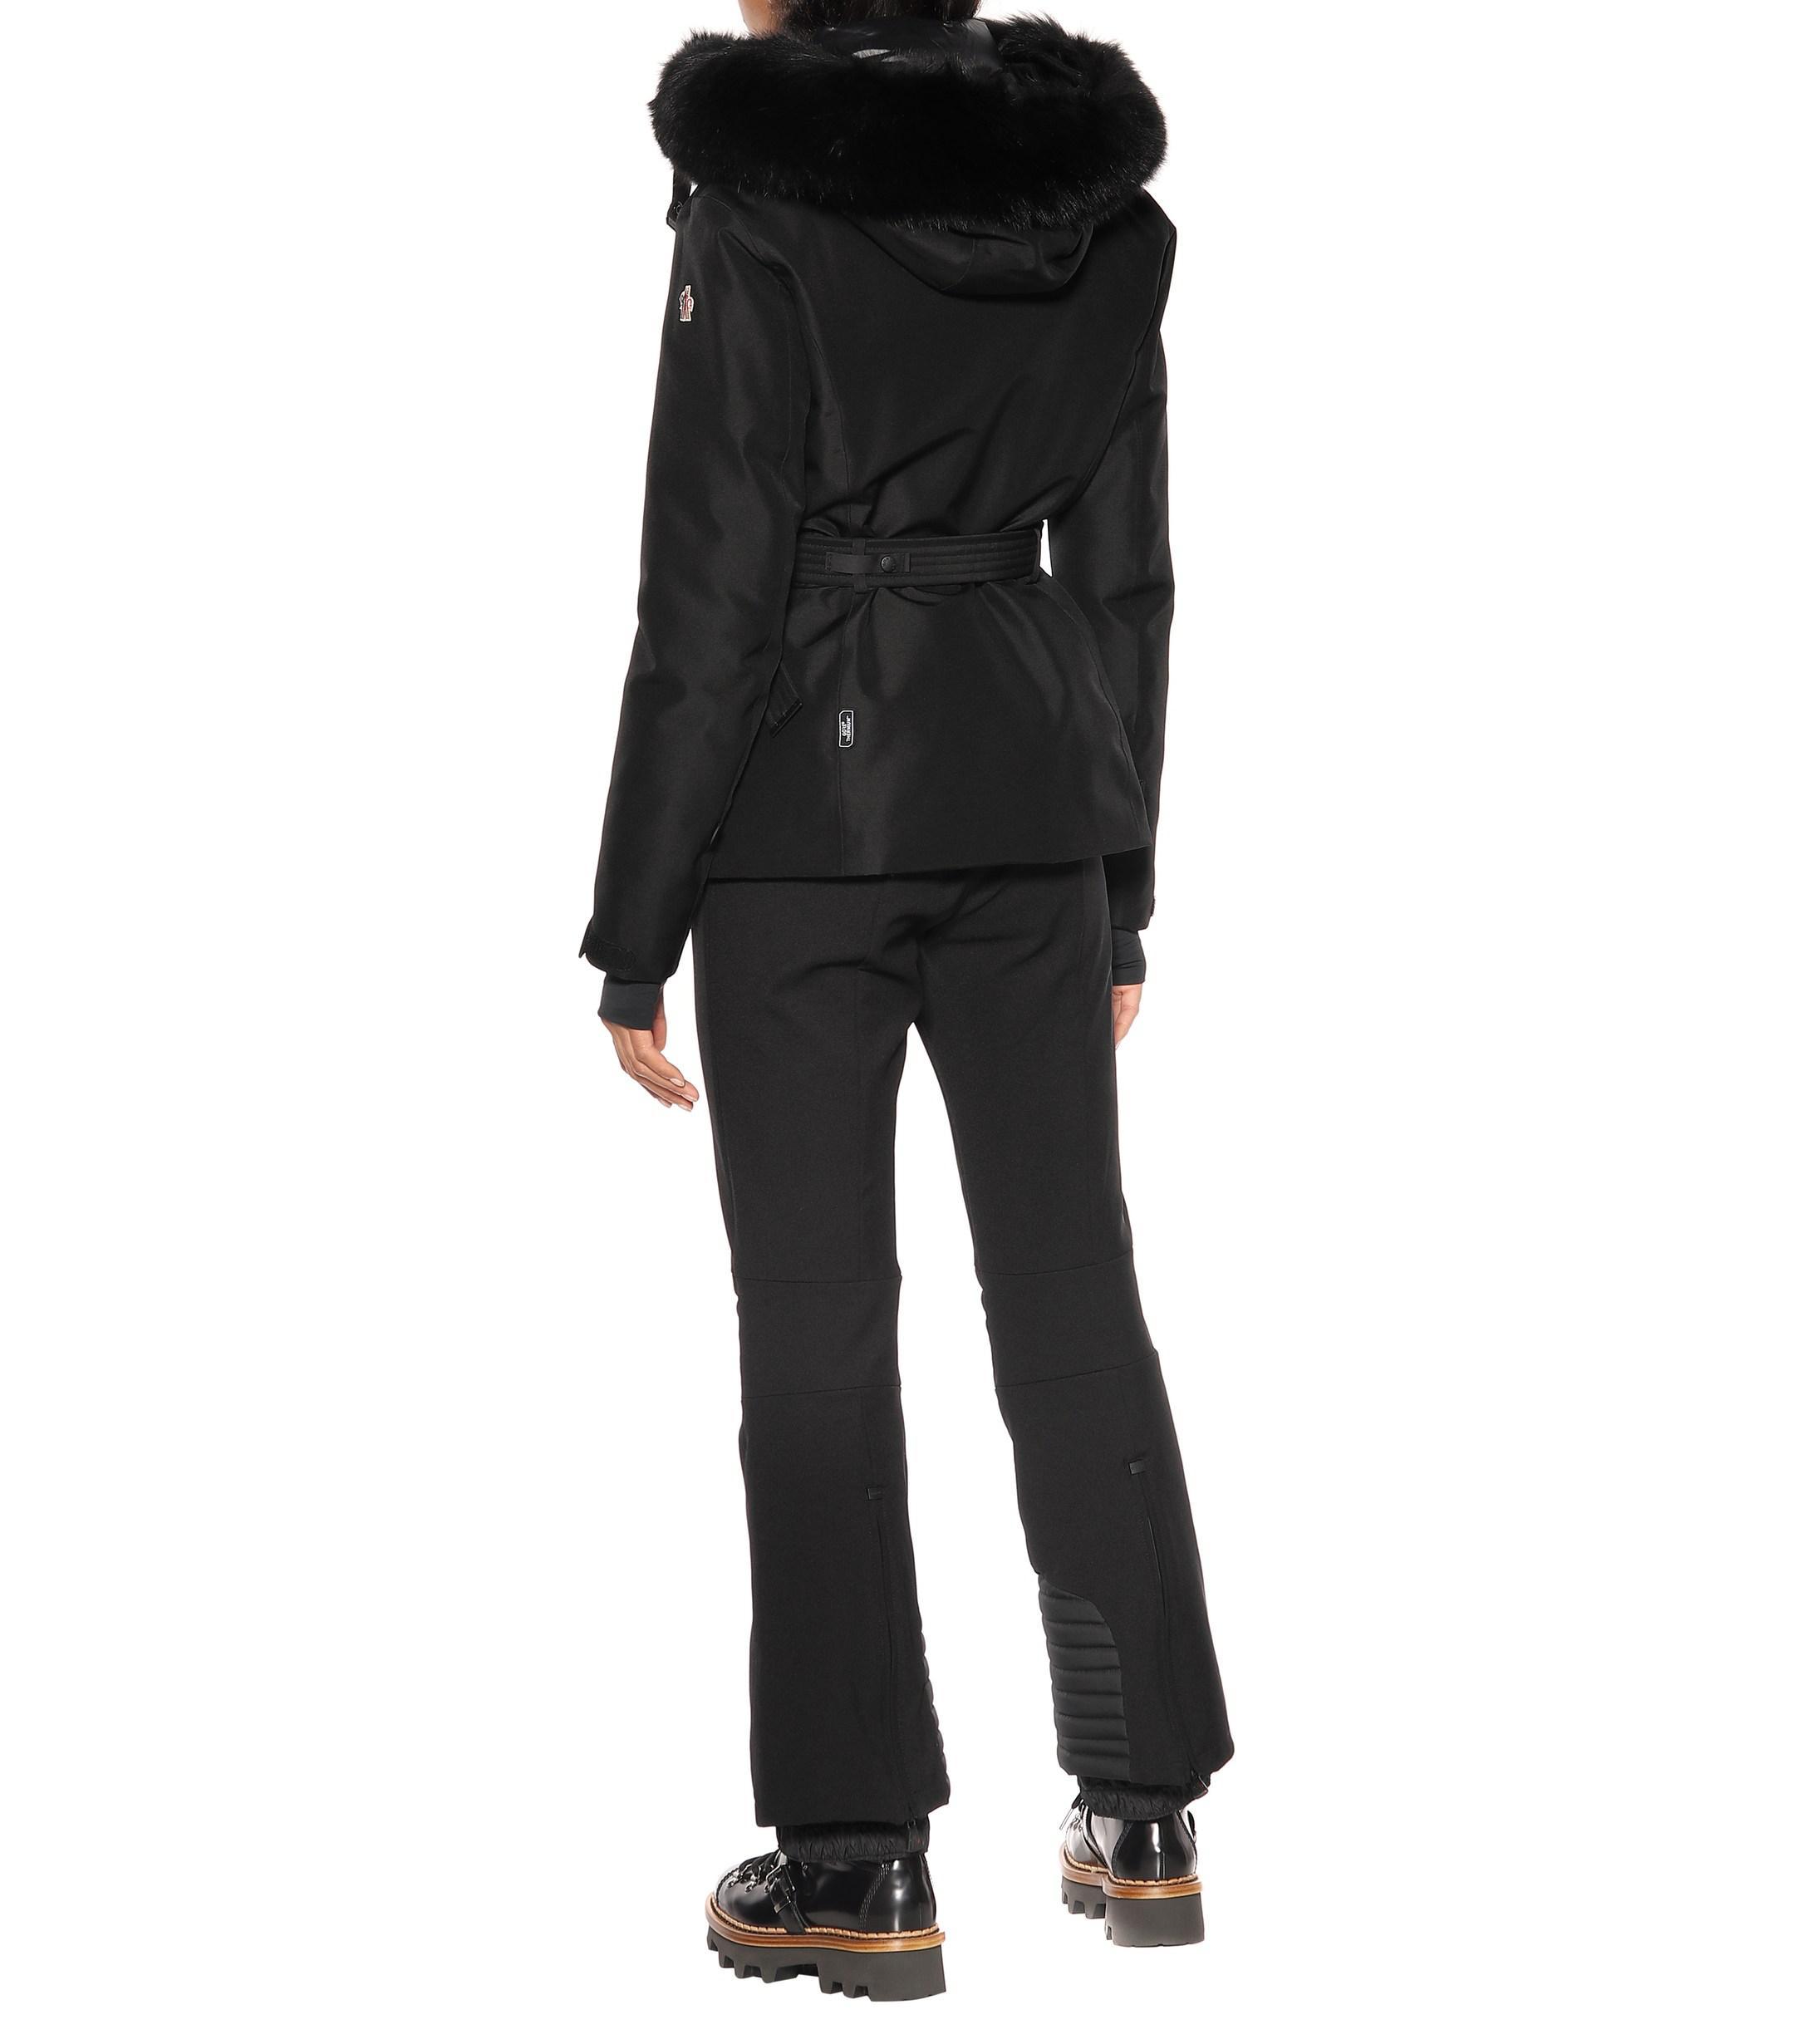 3 MONCLER GRENOBLE Fur Laplance Down Ski Jacket in Black Lyst